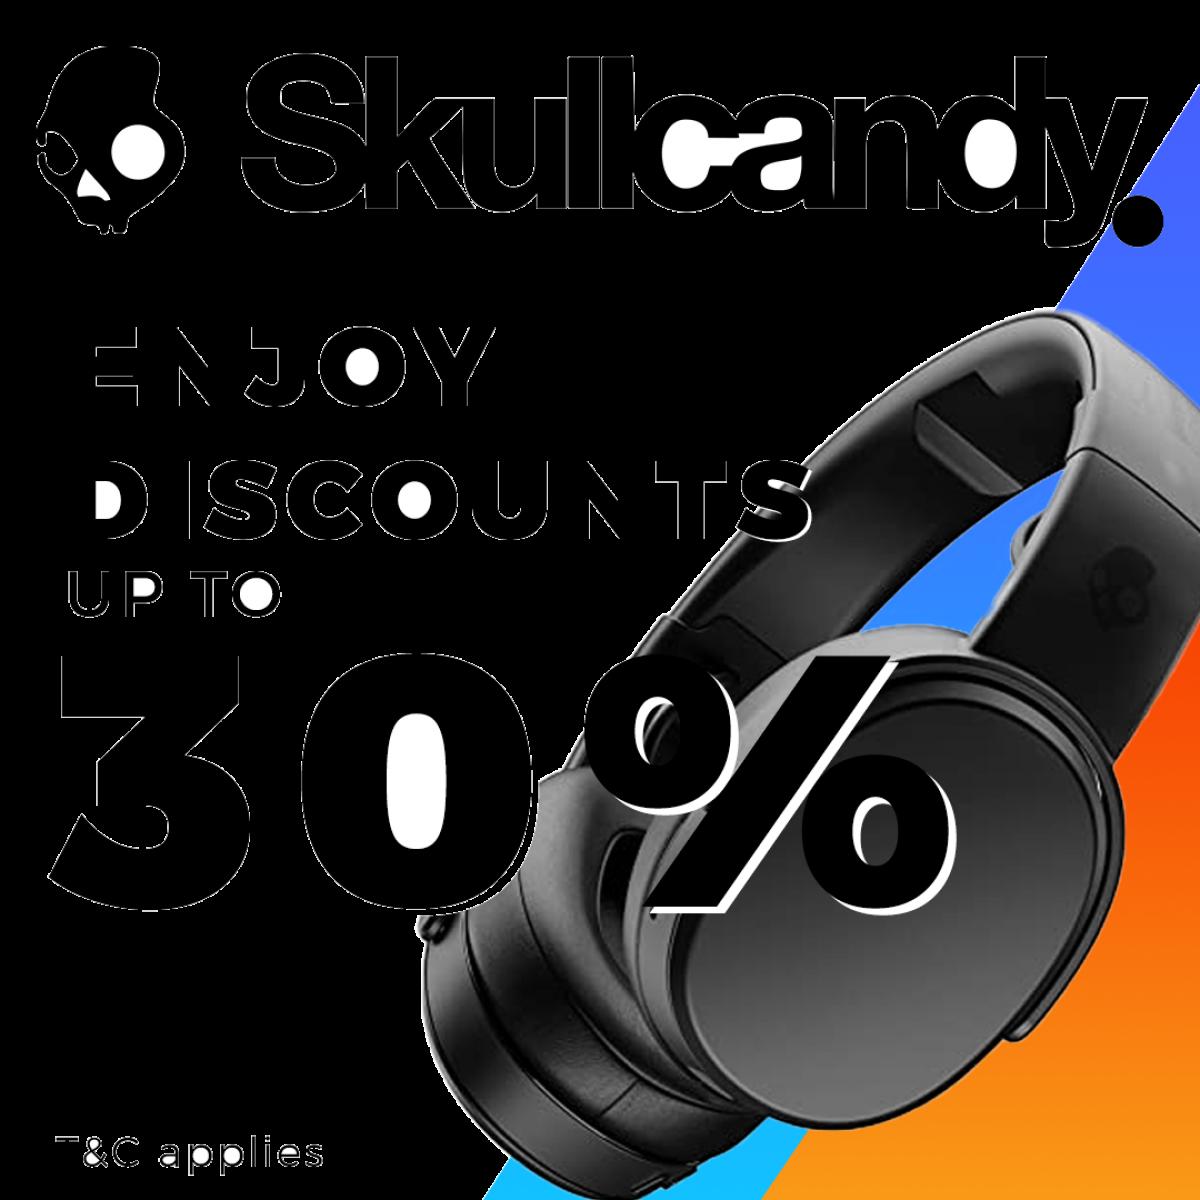 https://czone.my/istore/brands/skullcandy